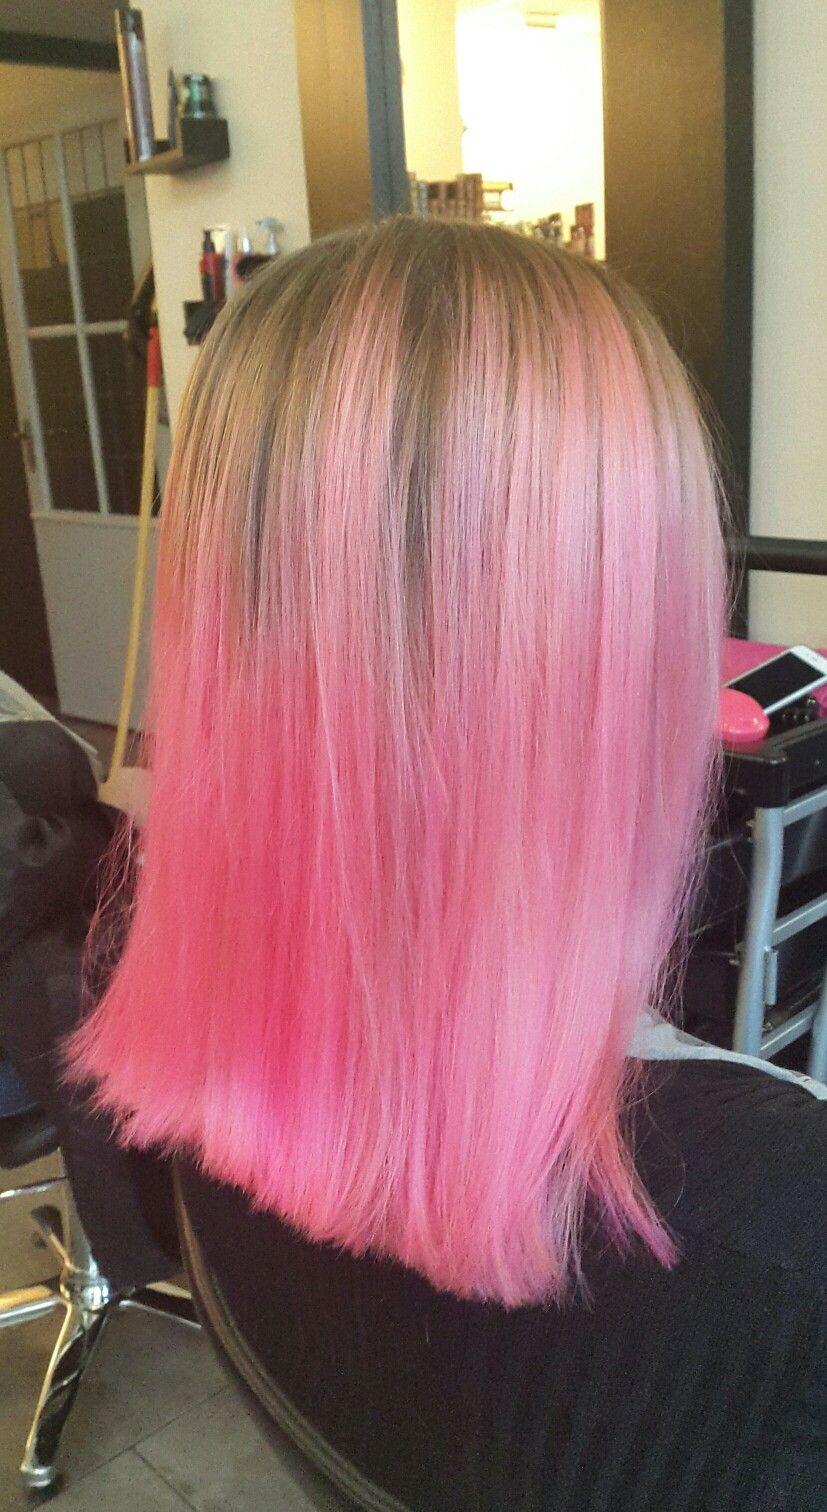 Carnation pink (Directions hairdye) + Matrix BondUltim8 #flamingopink #pinkhair #pinkhairdontcare #salon #hairsalon #hairdresser #hairstylist #trend #hairdye #hairdo #blowdry #hairstyling #beautifulhair #gorgeoushair #lovelyhair #greathair #haironpoint #hairinspiration #hairinspo #coloredhair #dyedhair #hairtrend #crazycolor #directionshair #hairgoals #haircrush #colorfulhair #directionshairdye #matrixhair #bondultim8